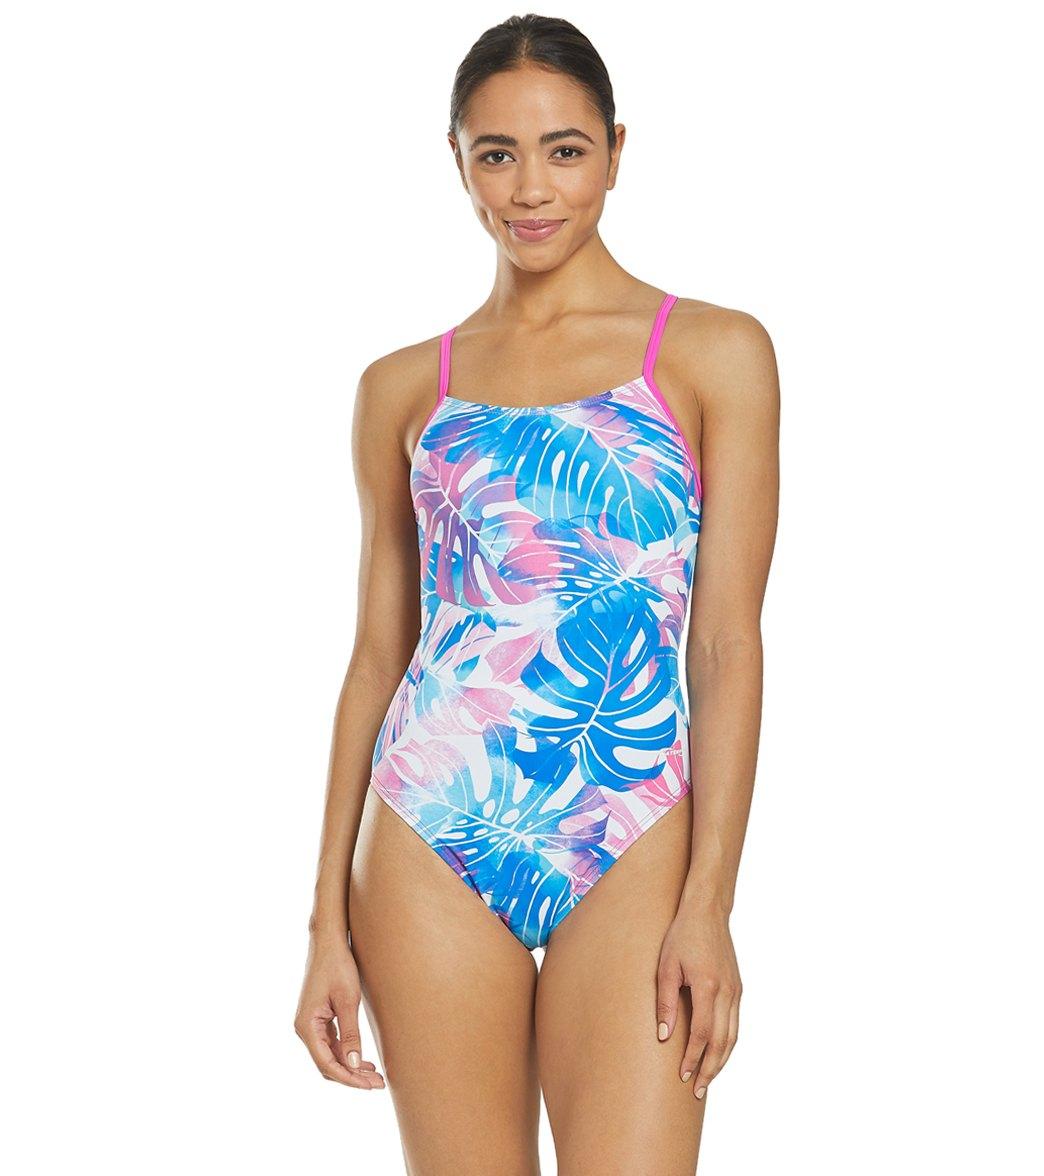 7f652bc7f Waterpro Women's Jungle One Piece Swimsuit at SwimOutlet.com